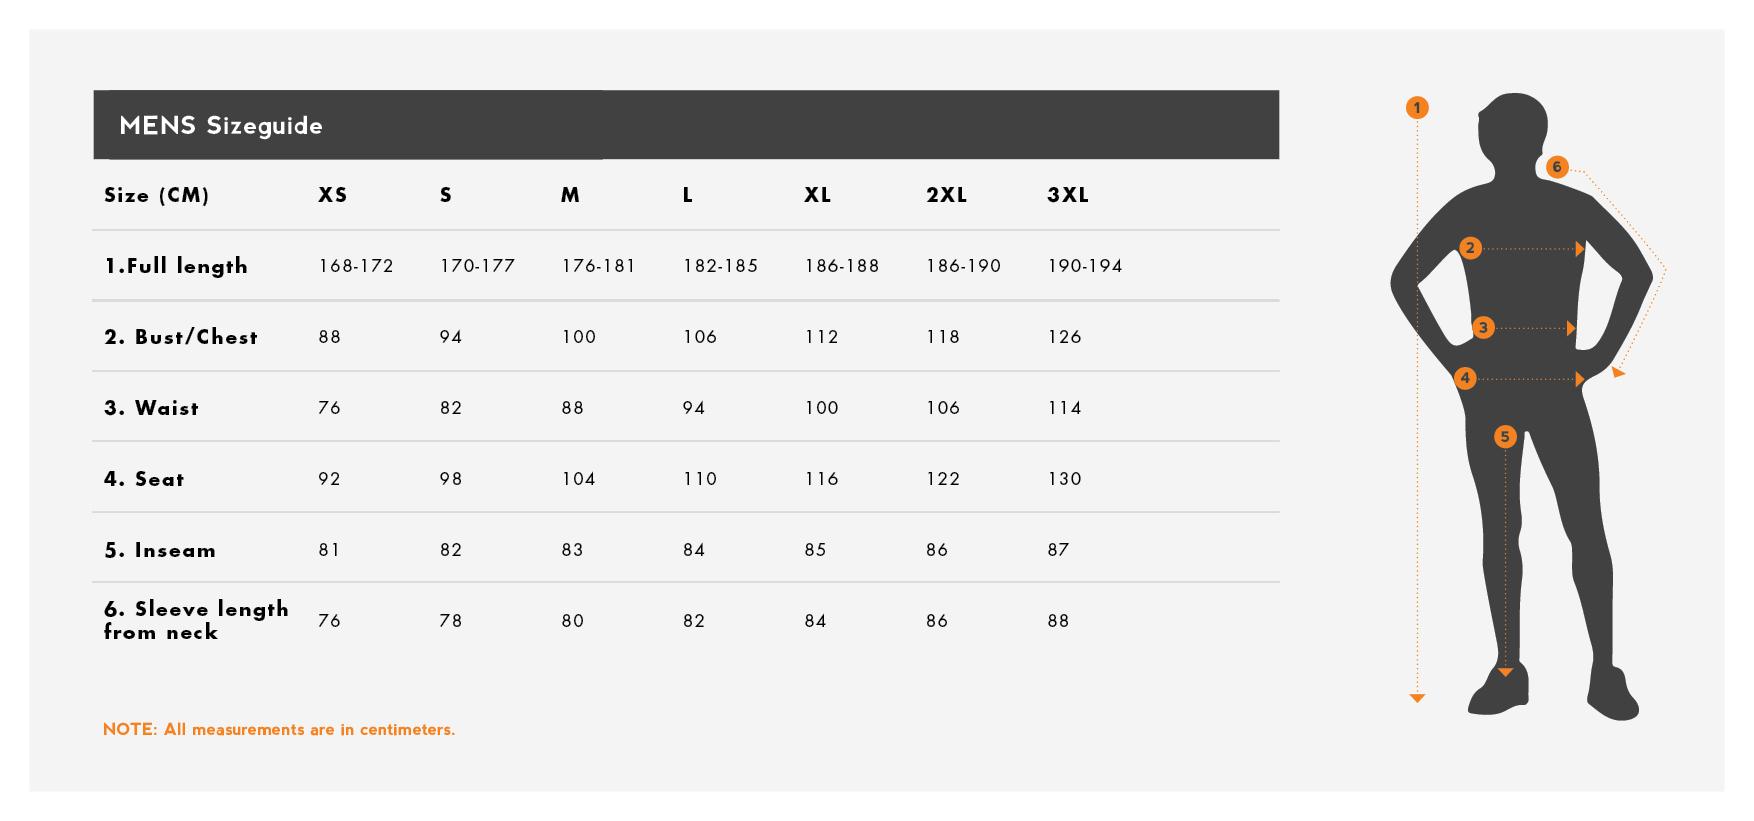 69e6fd3e6 Tenson regntøj mænd størrelsesguide / size chart / storleksguide ...